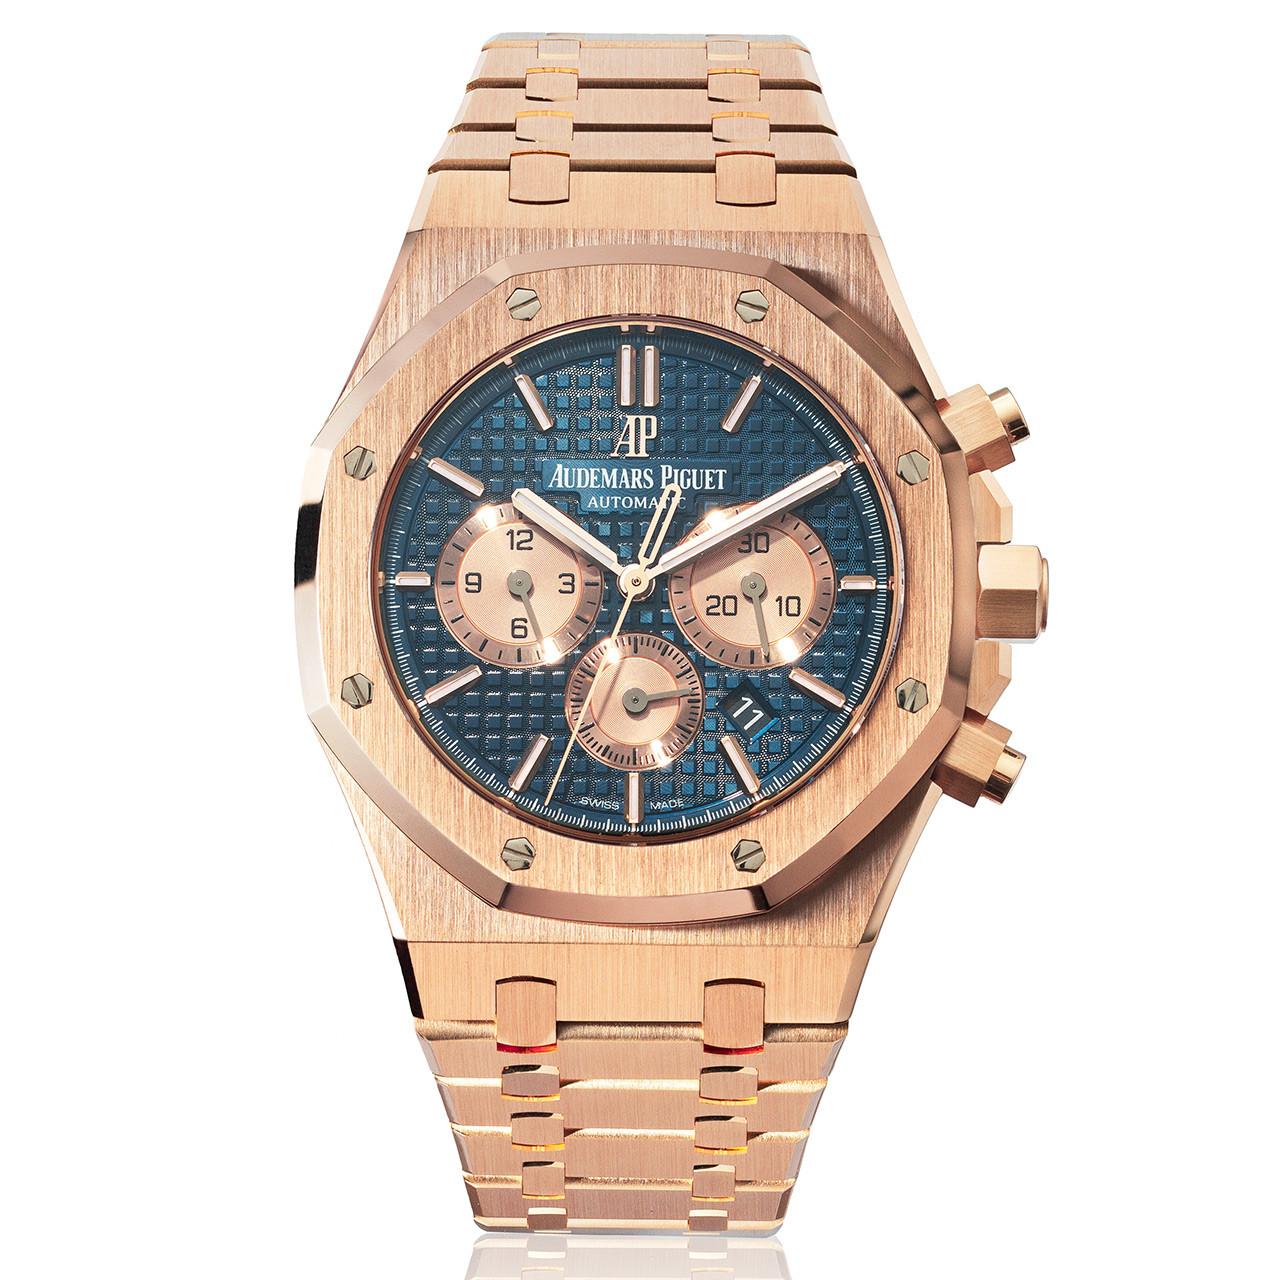 153c9f13e2a3 Audemars Piguet Royal Oak Chronograph Automatic Men s Watch - Shyne Jewelers